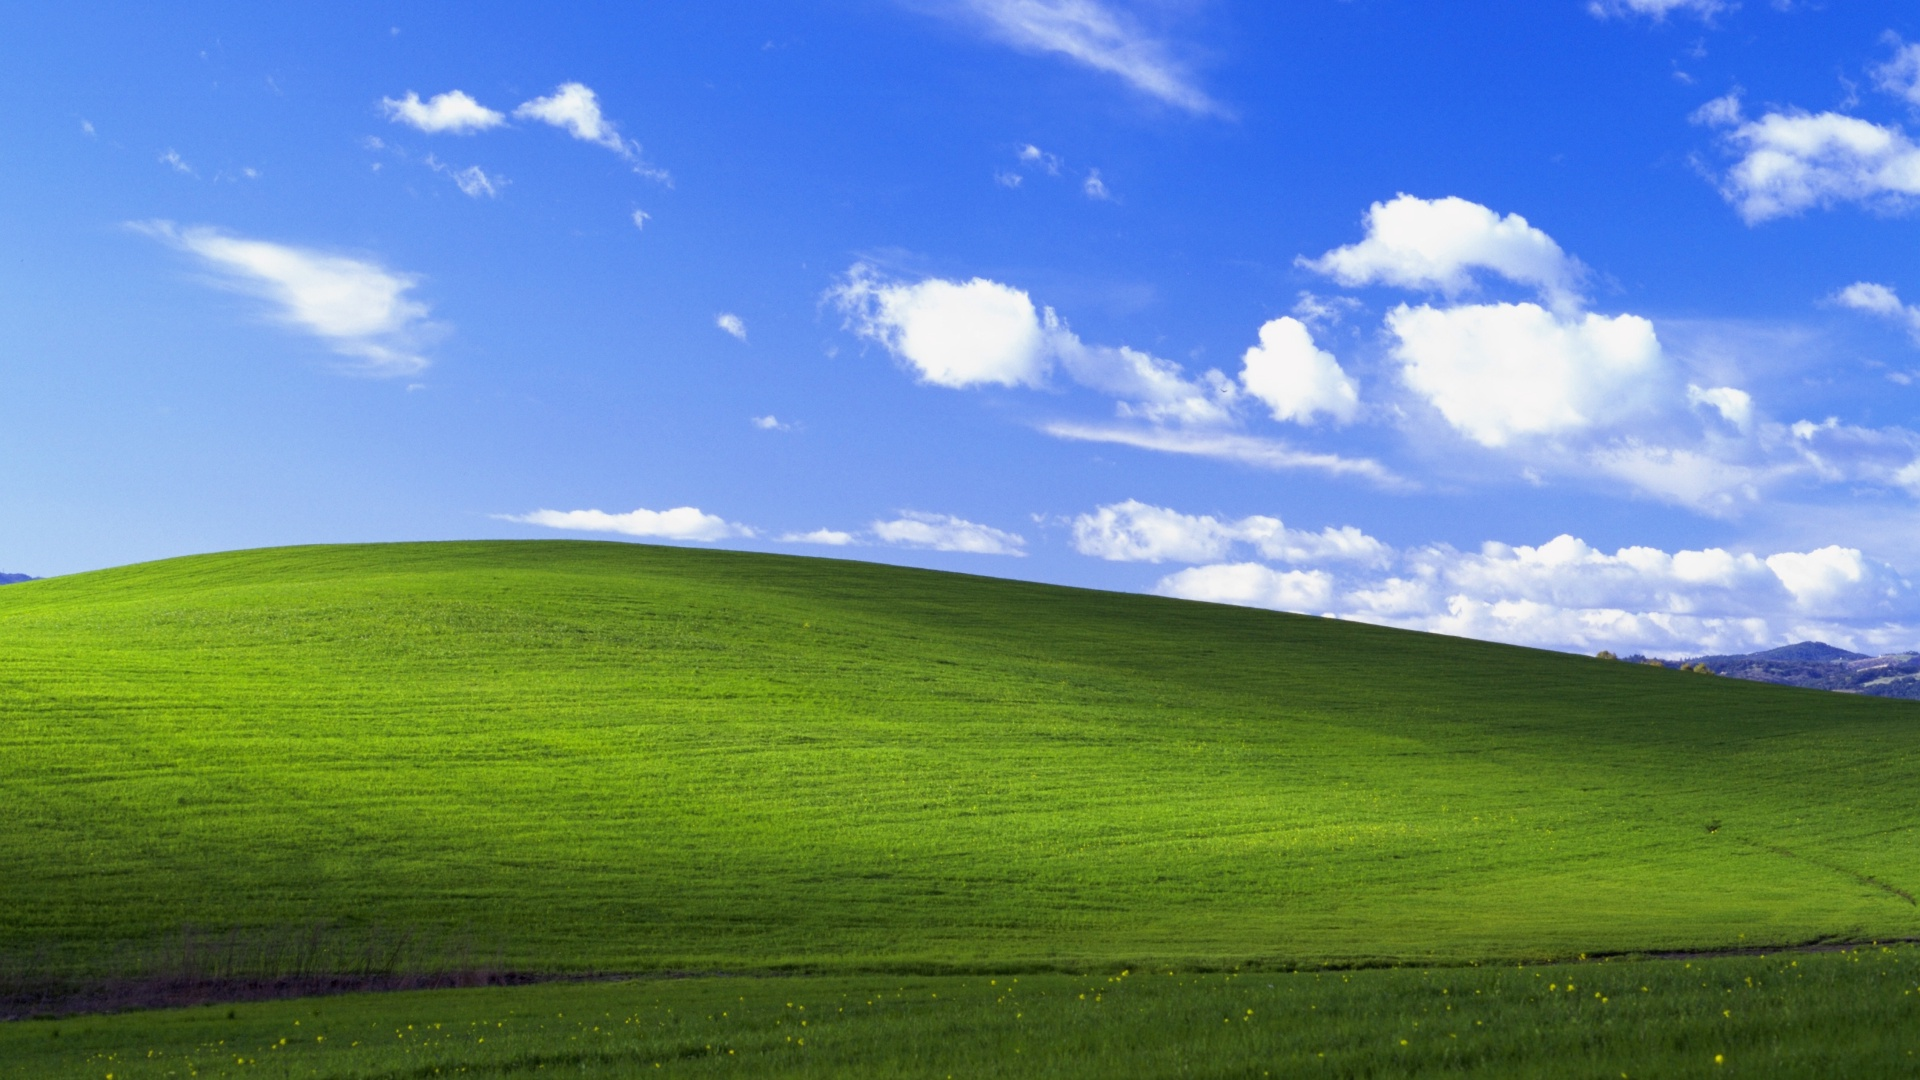 1920x1080 Windows XP wallpaper 1920x1080